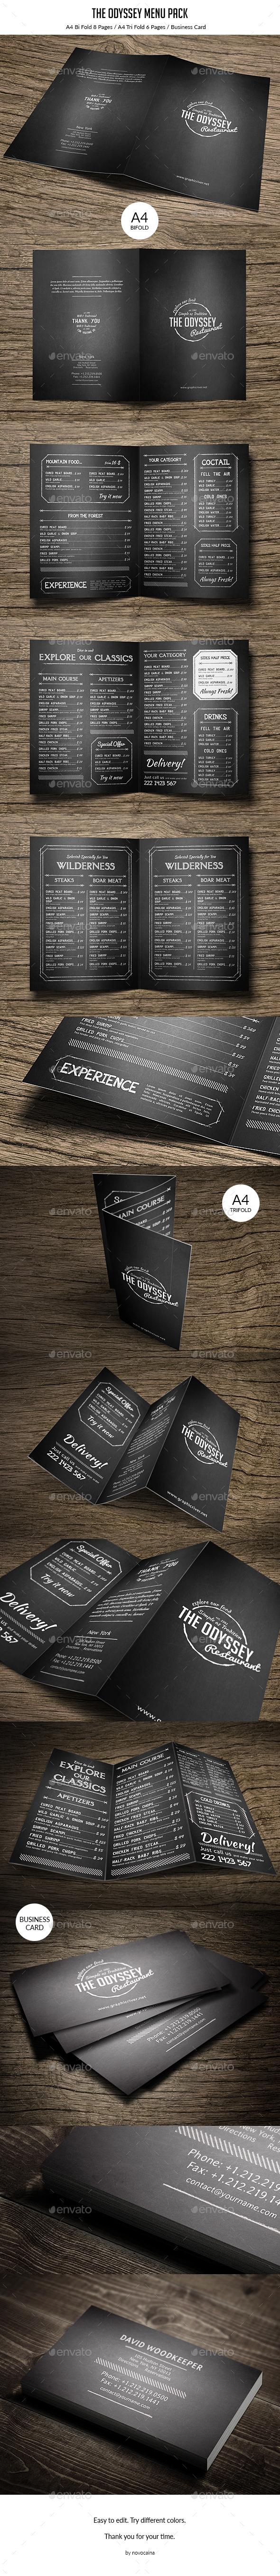 The Odyssey Menu Pack - Minimal and Retro - Food Menus Print Templates